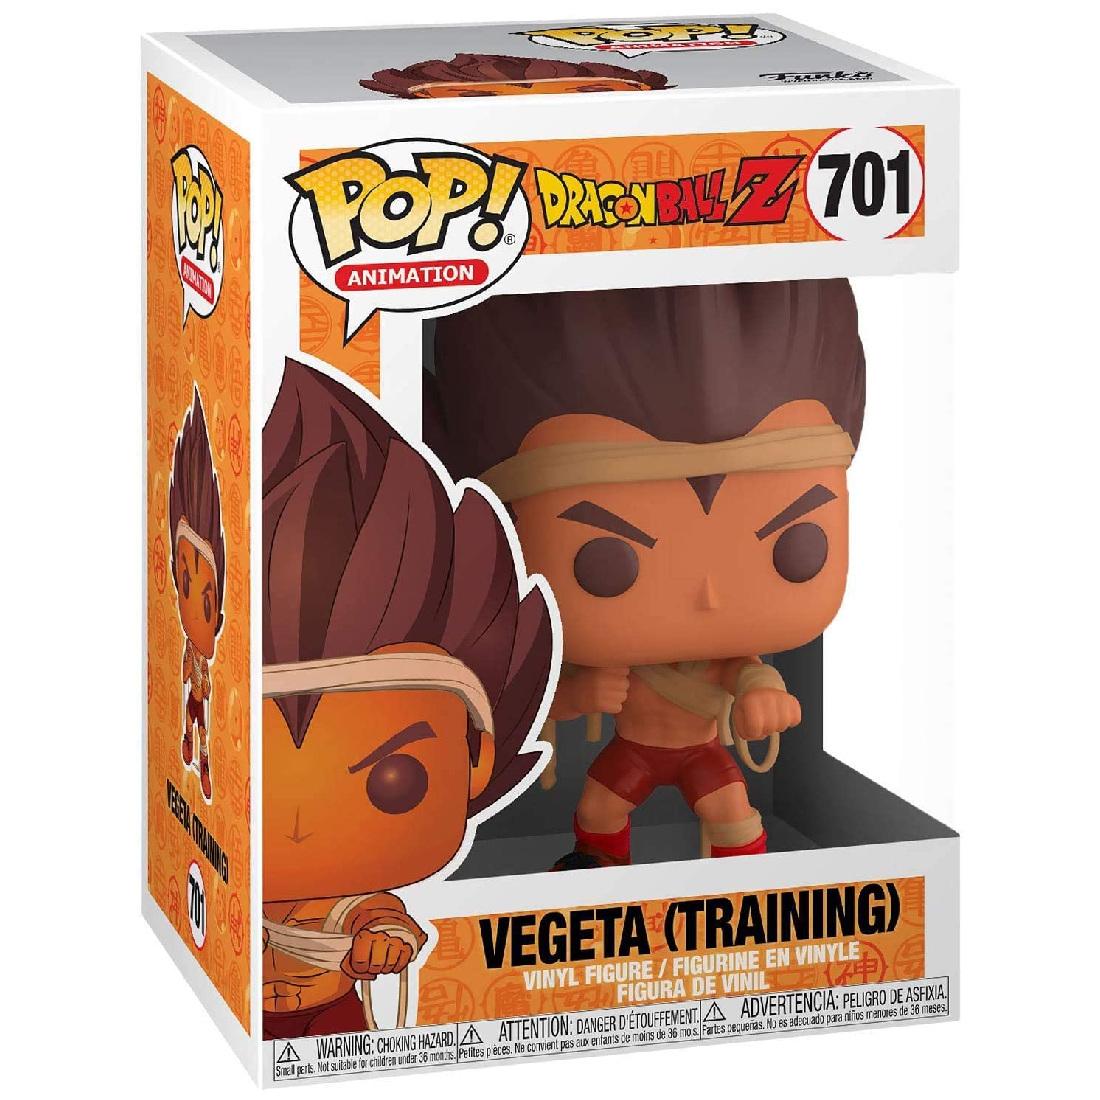 Funko Pop! Animation Dragon Ball Z 701 Vegeta Training